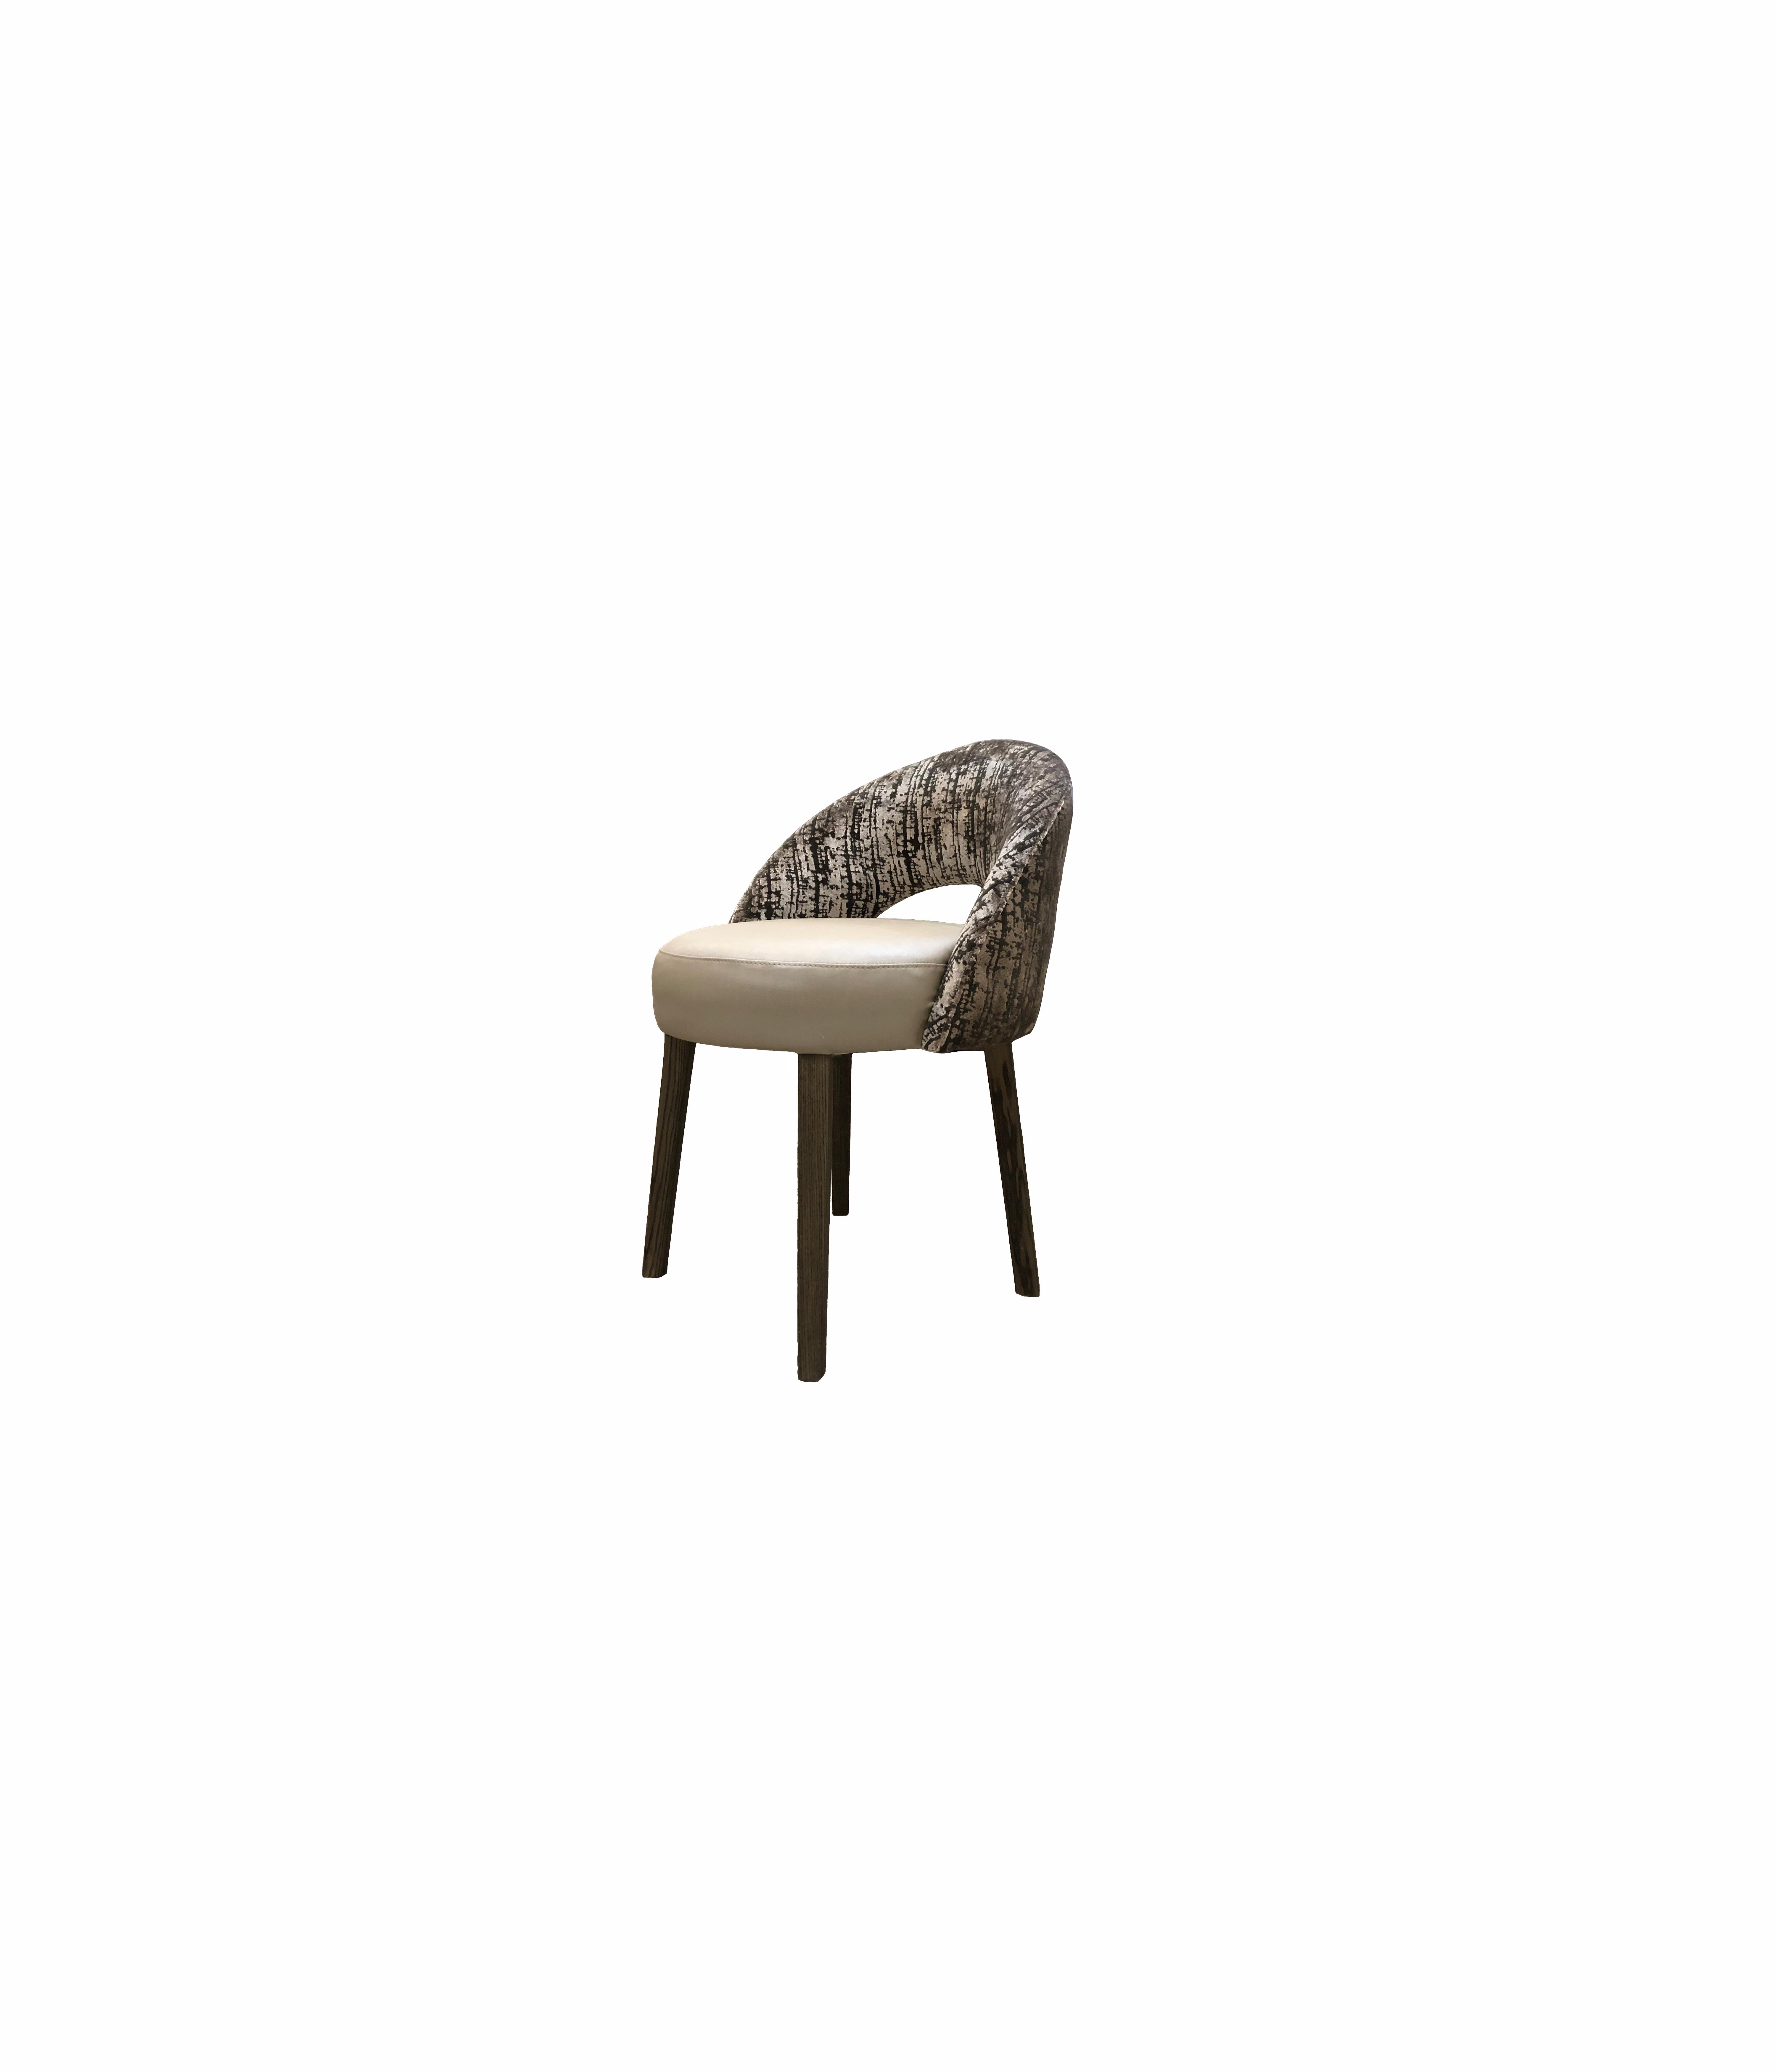 Risson dining chair